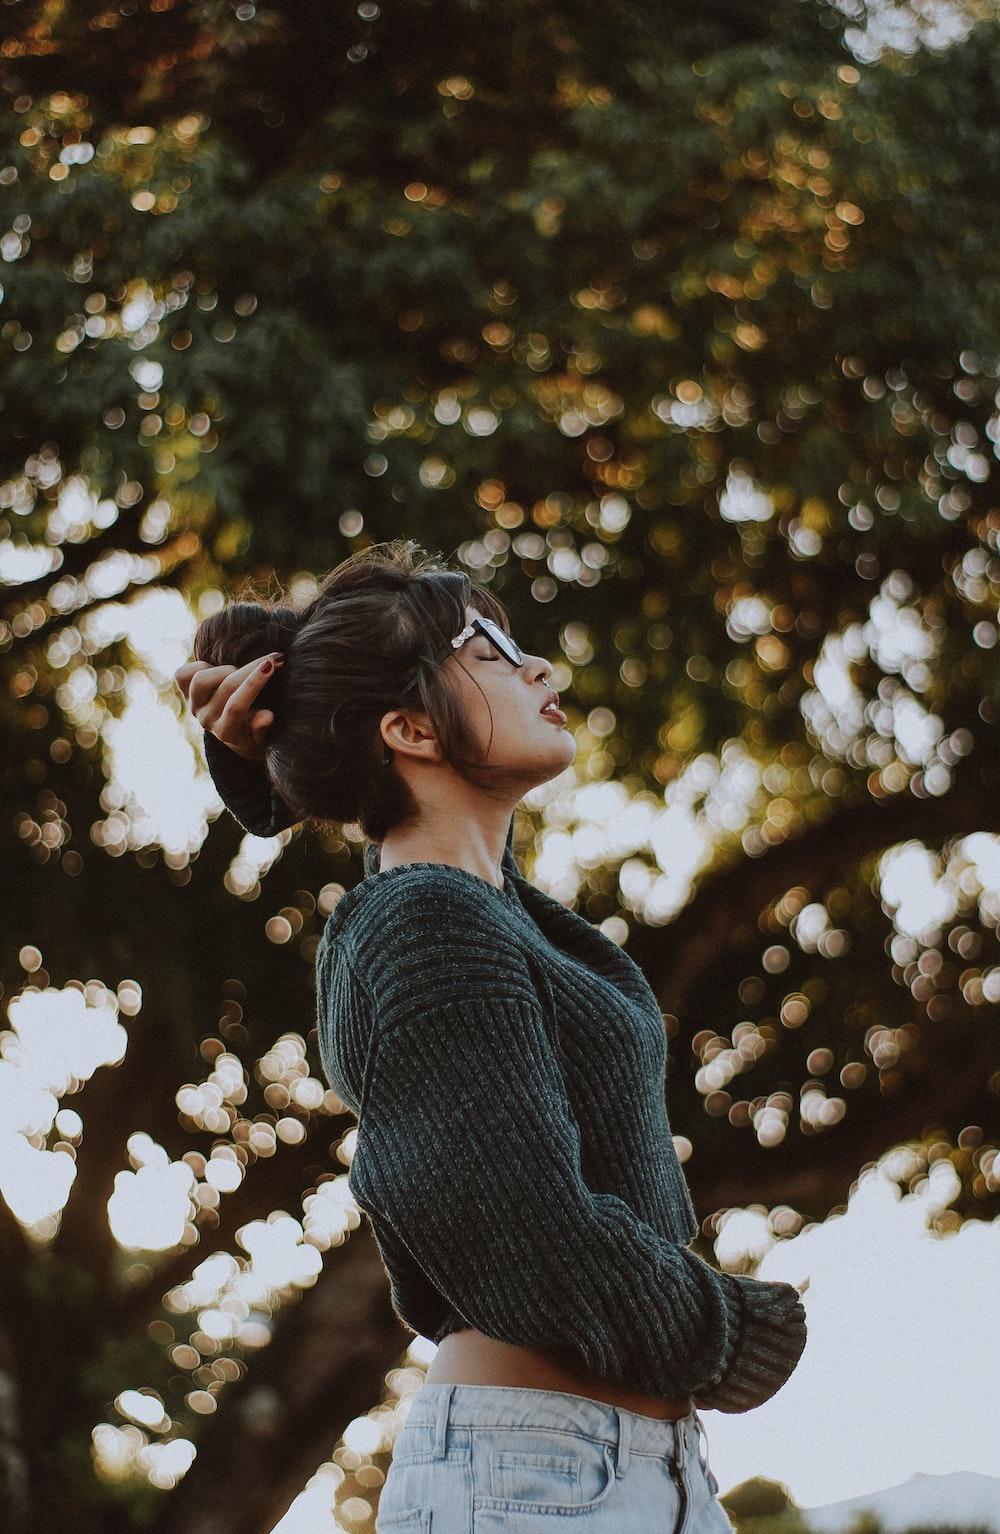 woman wearing gray sweater near tree